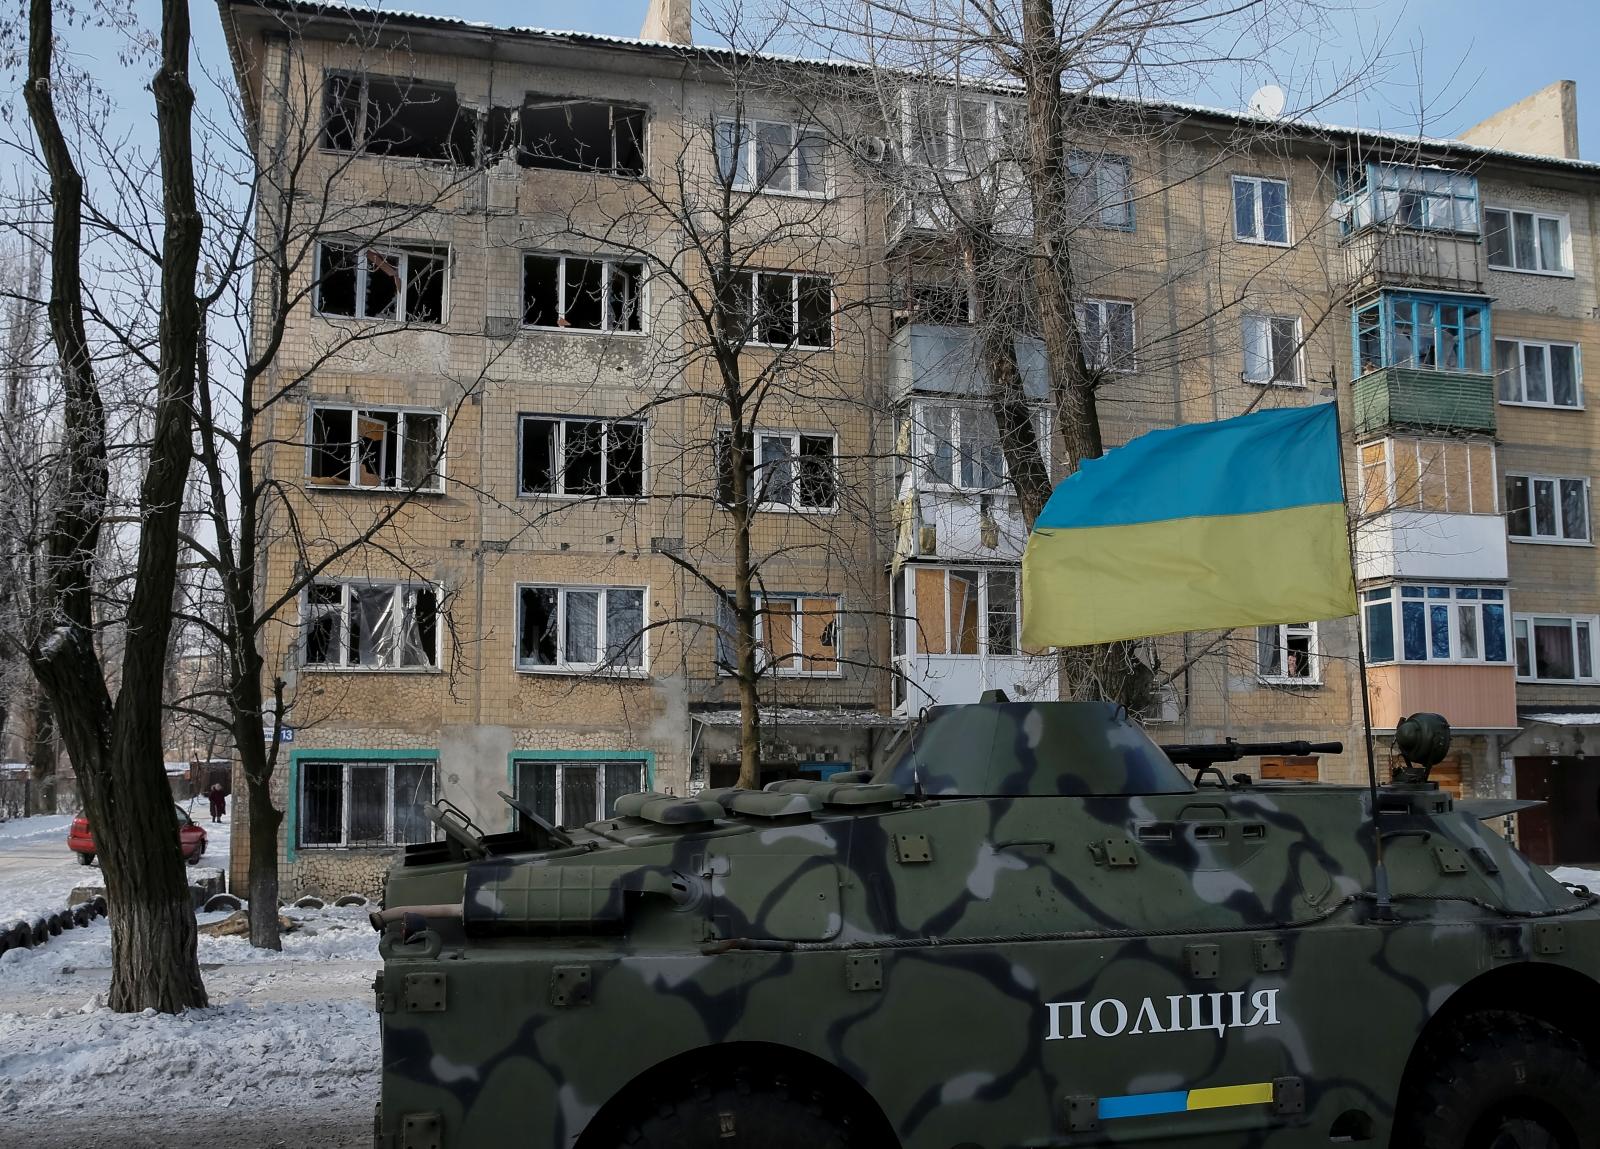 Avdiyivka Ukraine shelling